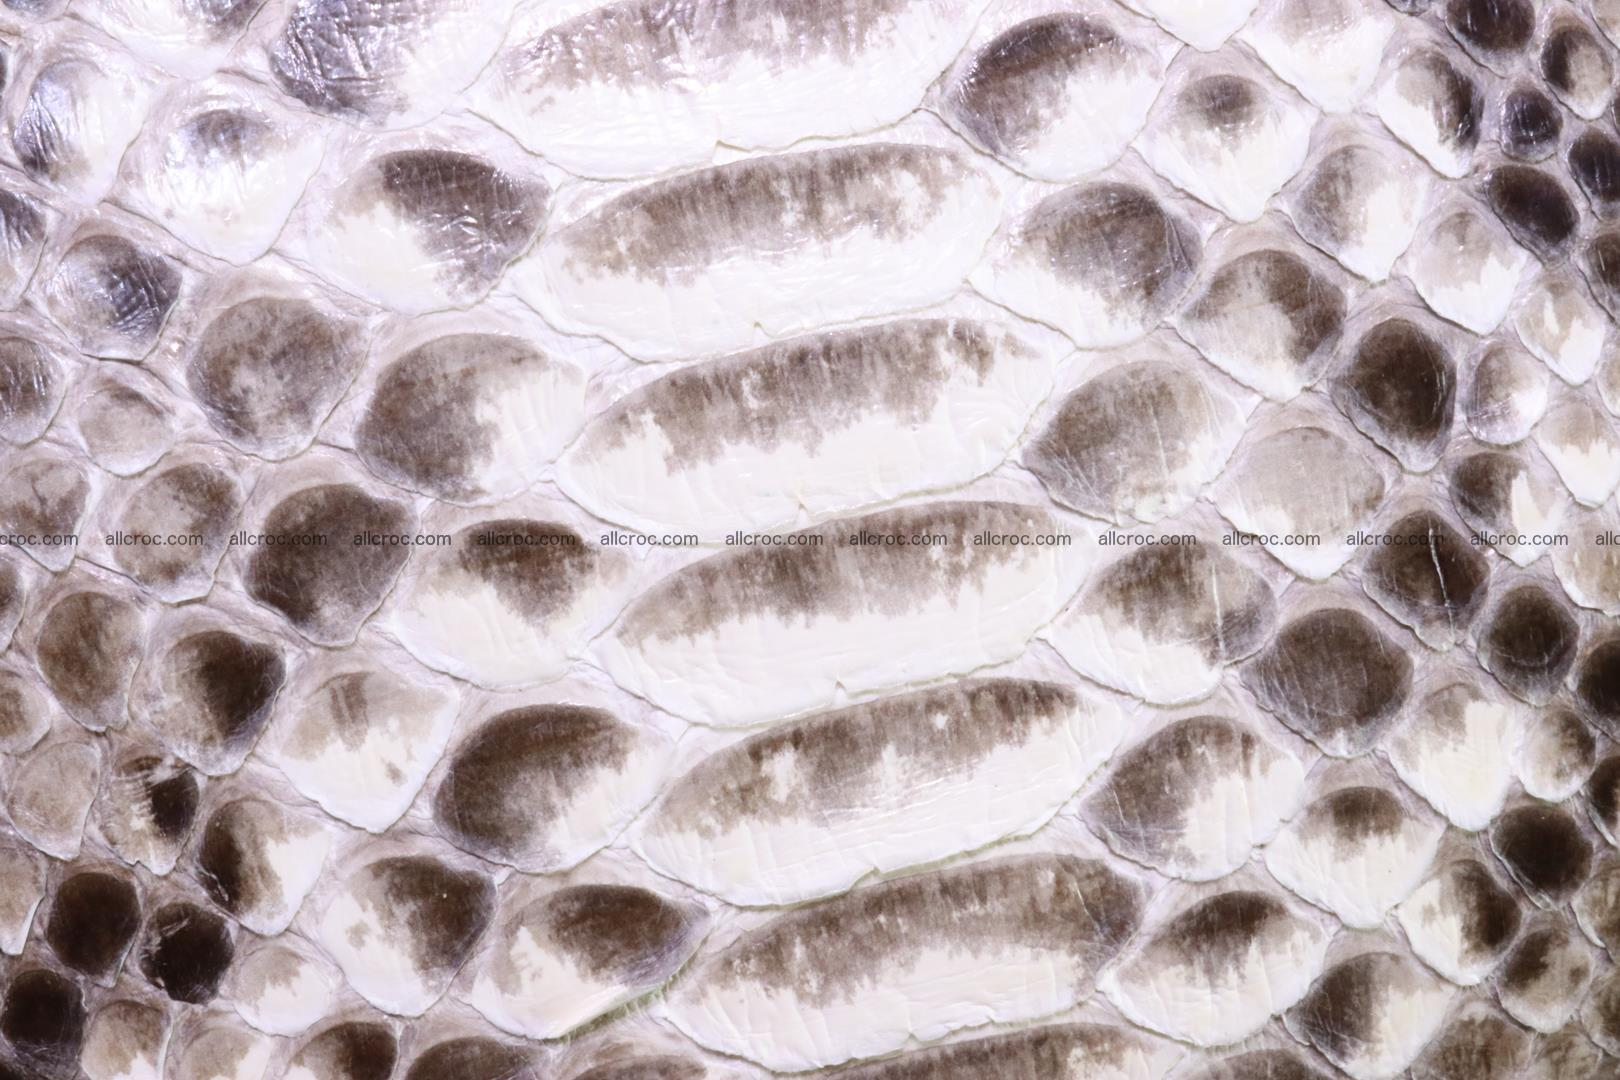 Python skin handbag for lady from genuine Python skin 198 Foto 8